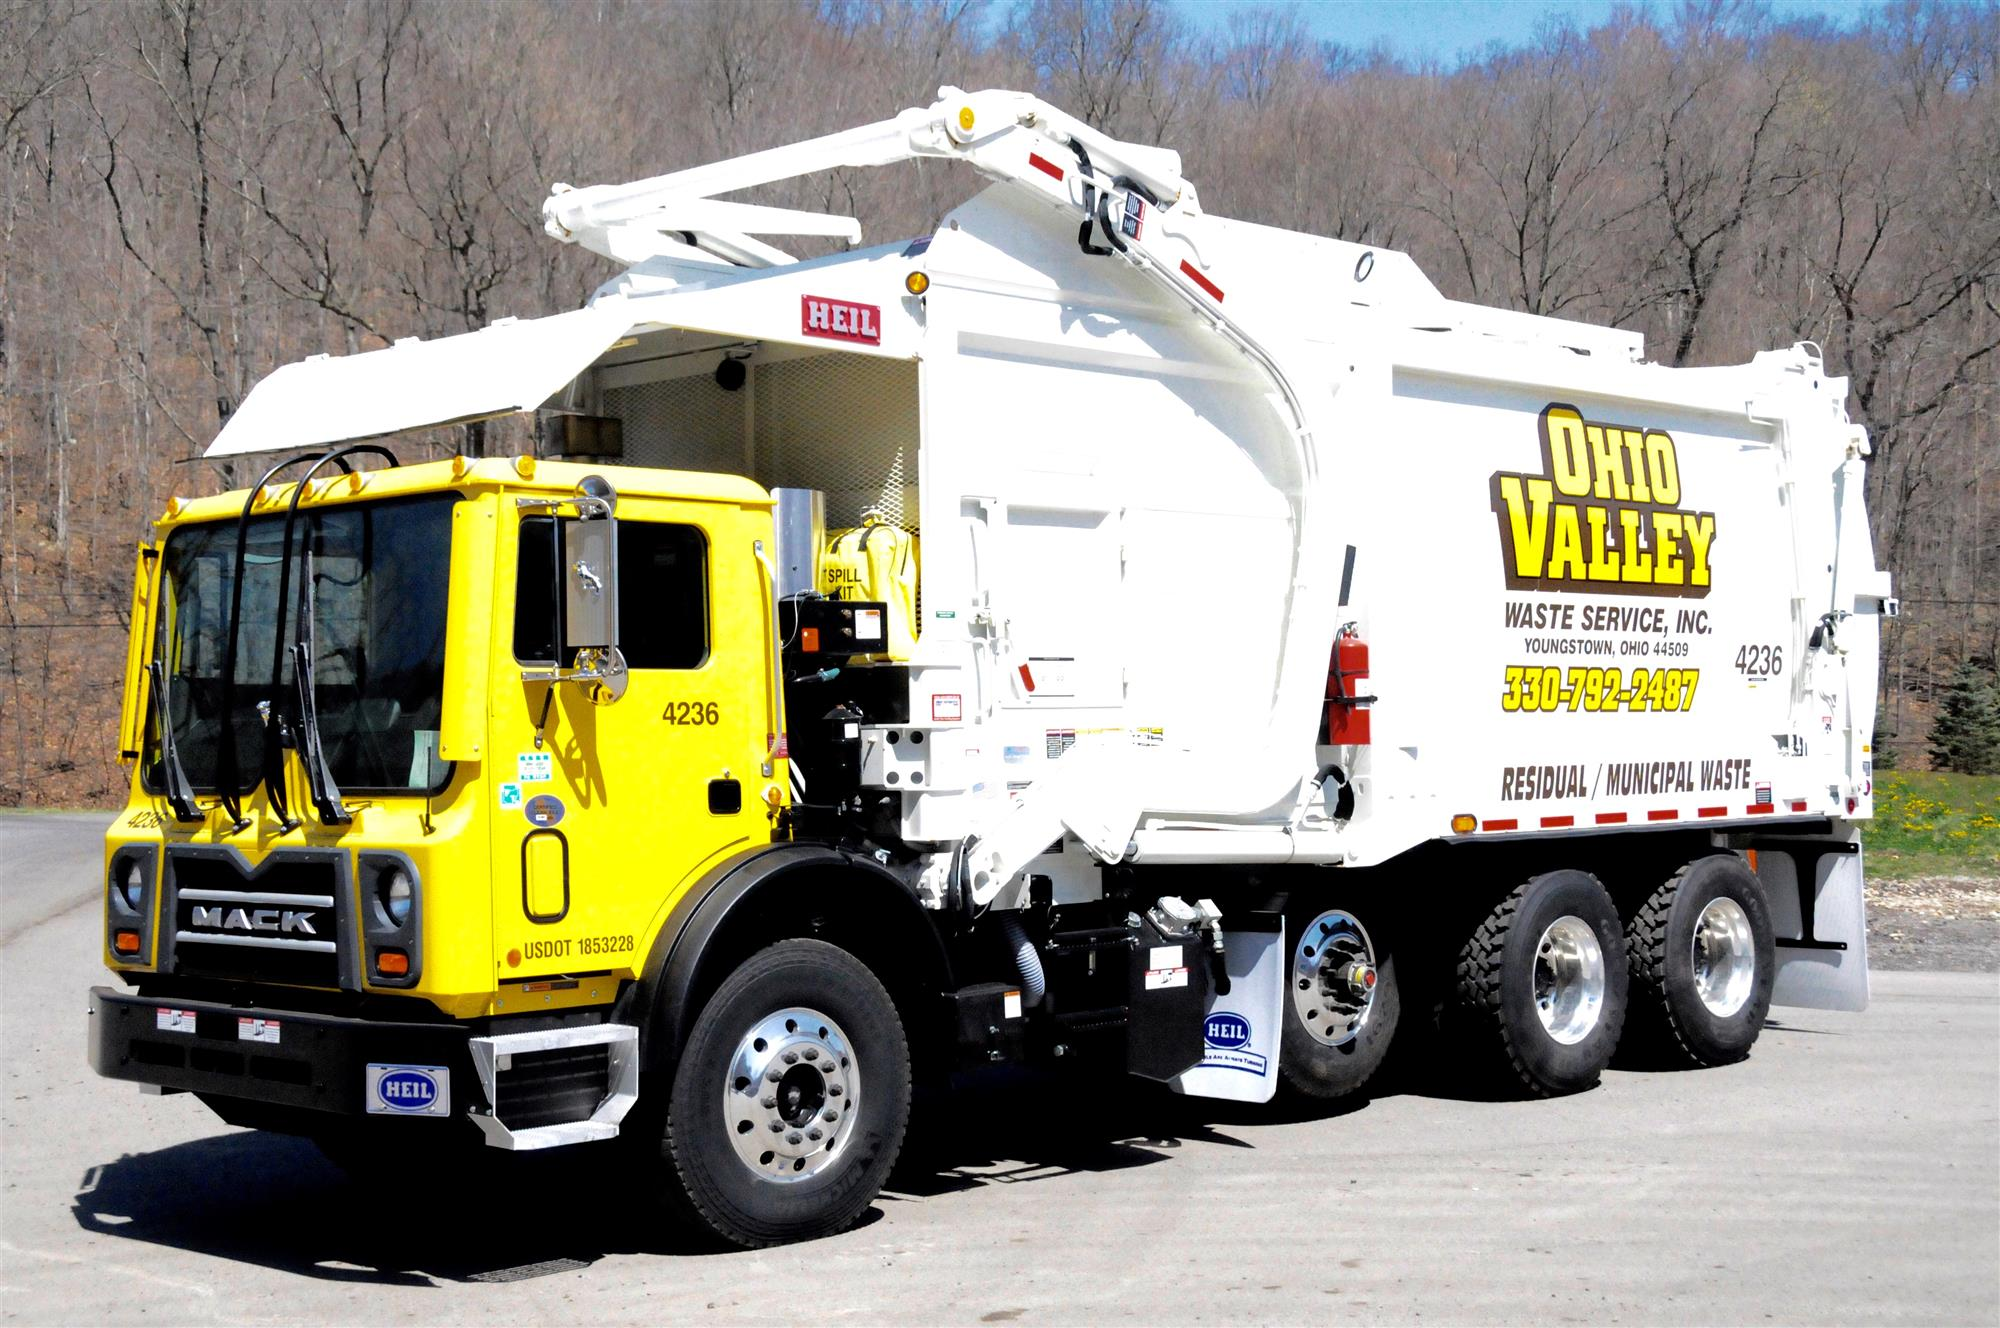 Garbage truck - Wikipedia